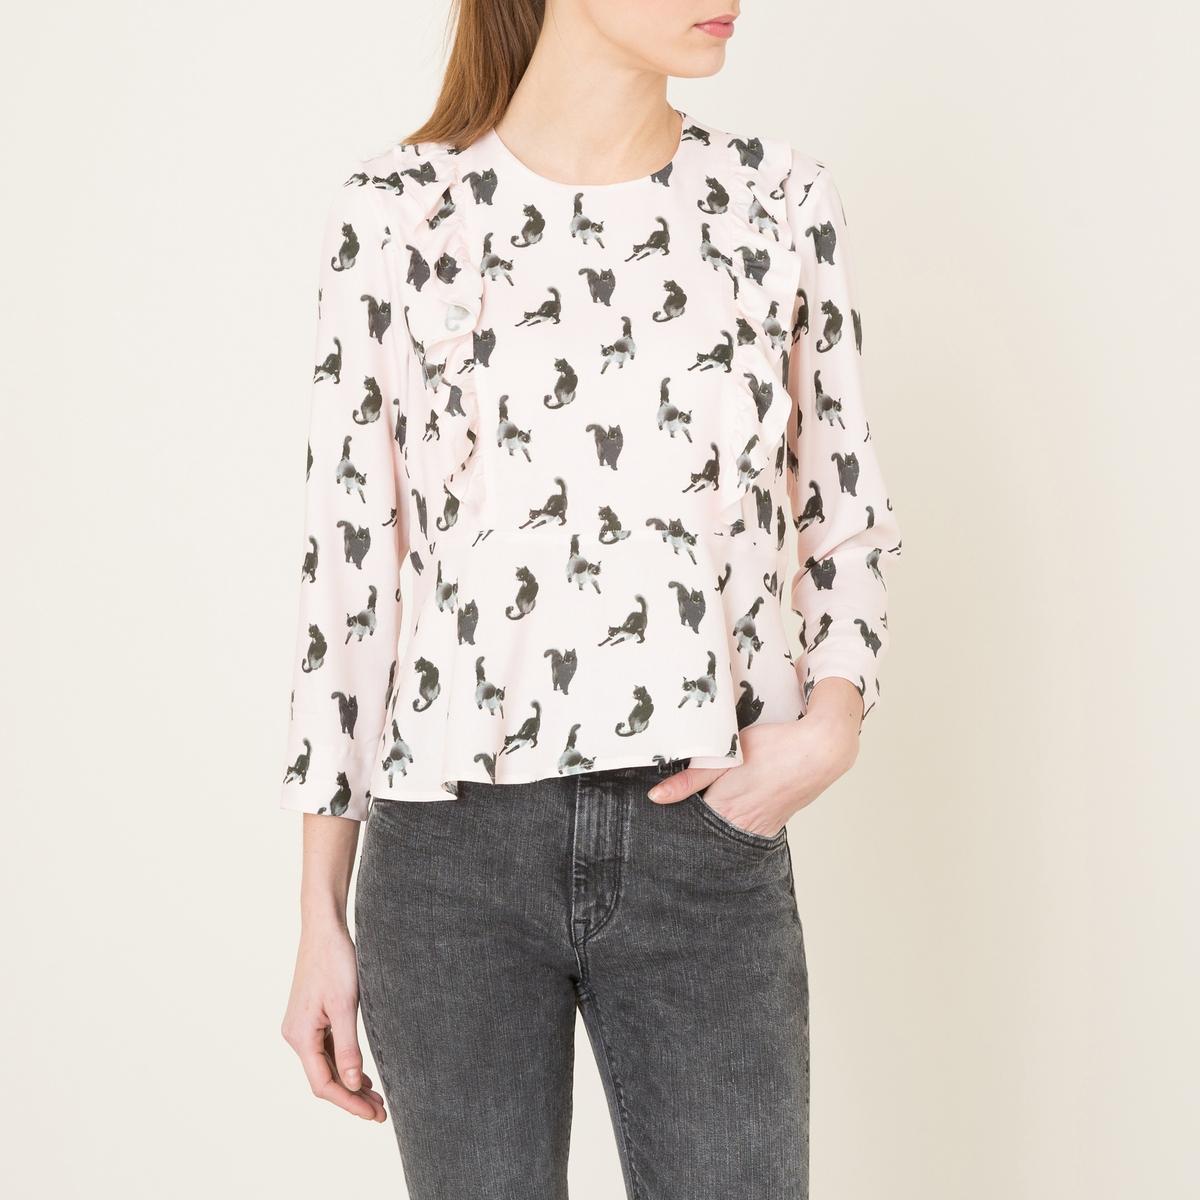 Блузка с рисунком « кошки » DEVONСостав и описание   Материал : 100% вискоза   Марка : PAUL AND JOE SISTER<br><br>Цвет: розовый